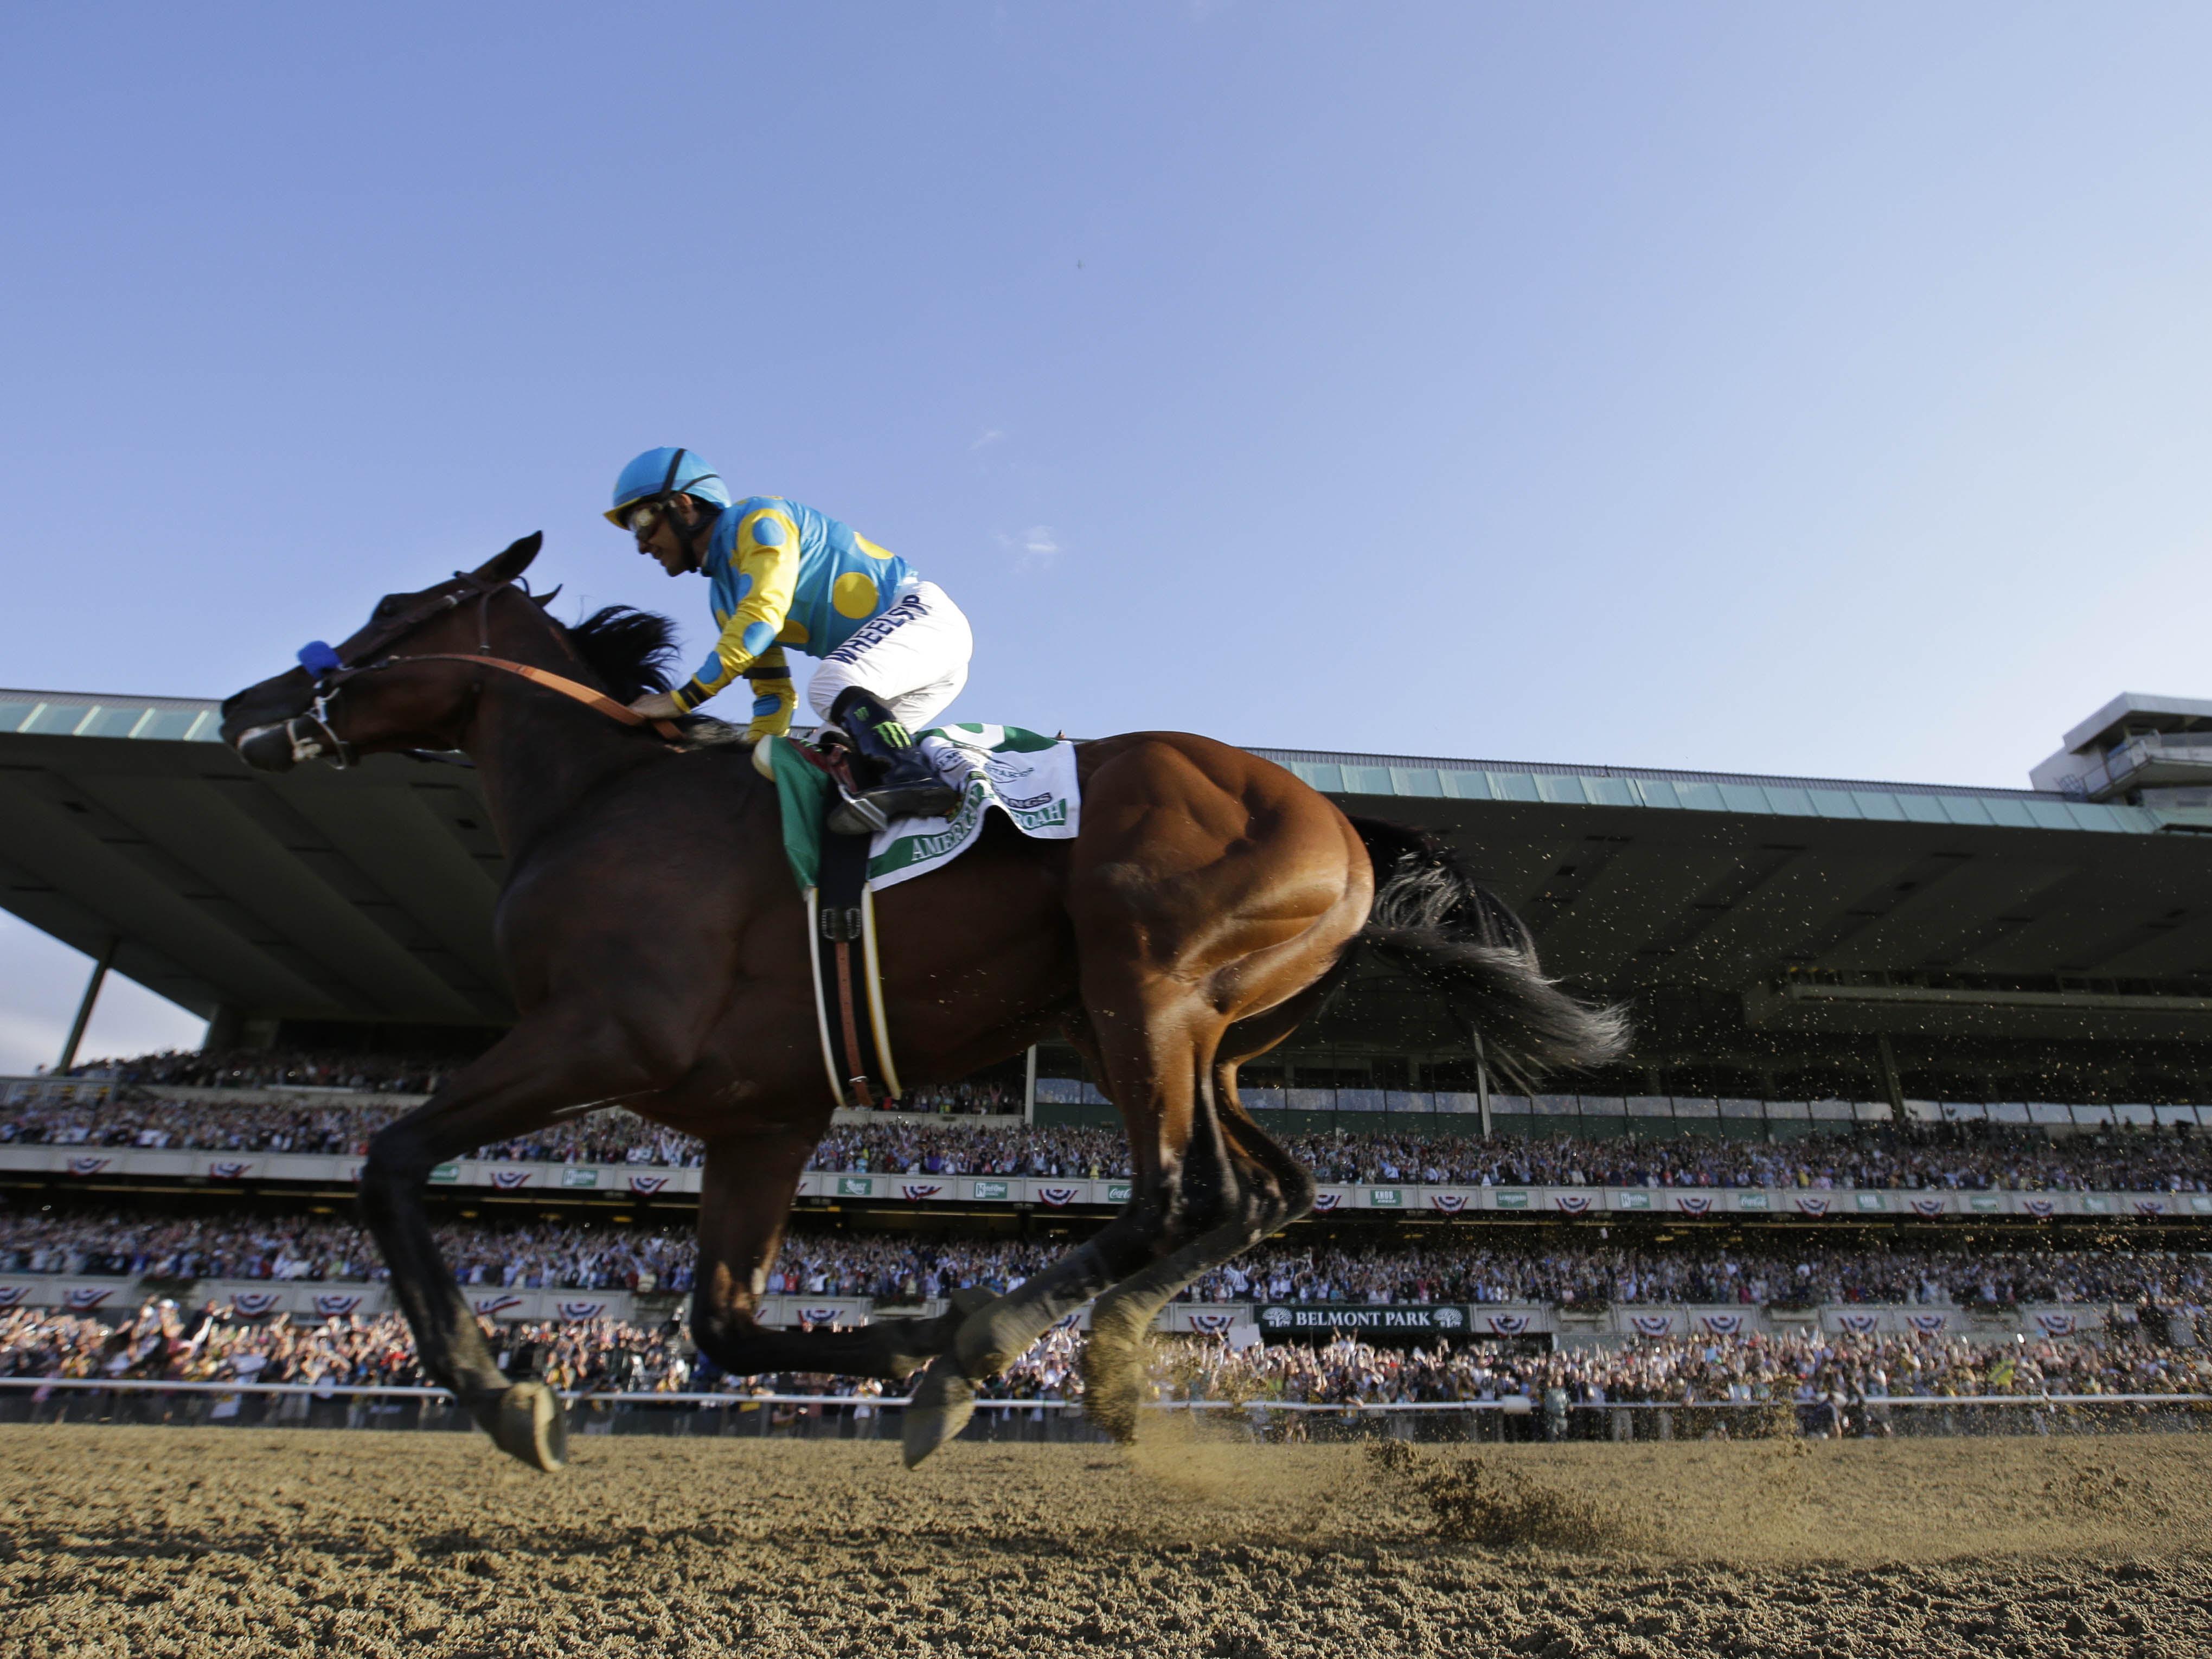 American Pharoah S A Superhorse But He S No Secretariat Fivethirtyeight